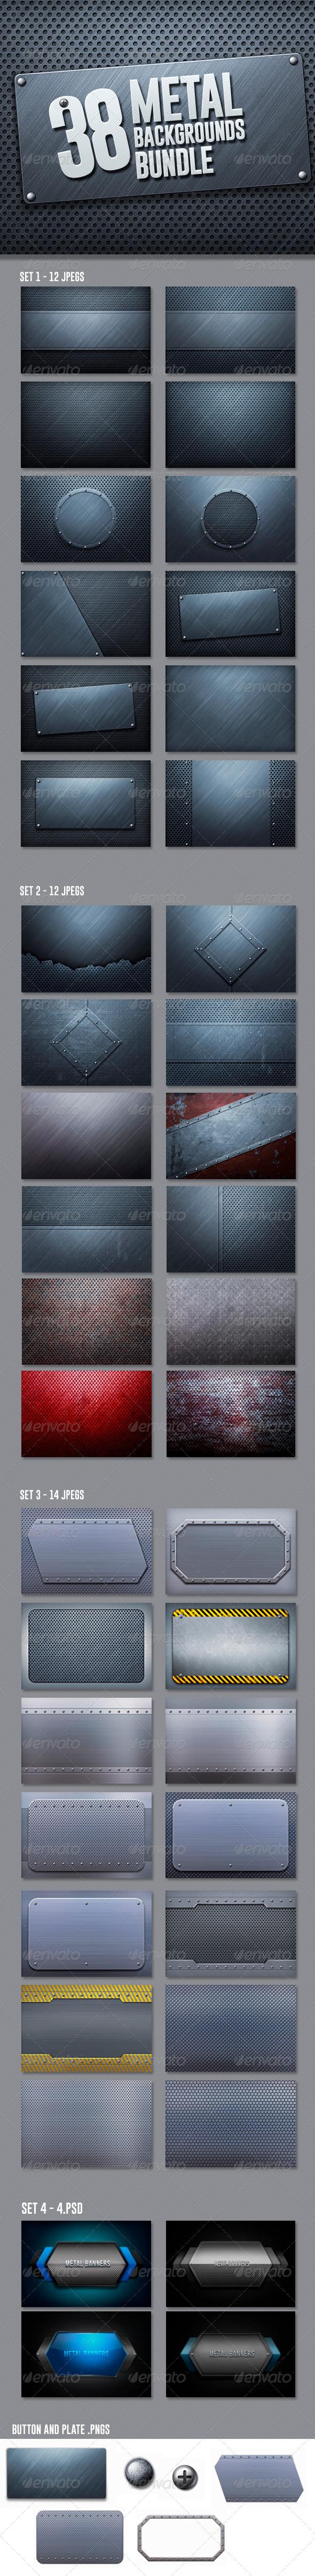 GraphicRiver 42 Metal Backgrounds Bundle 6756296